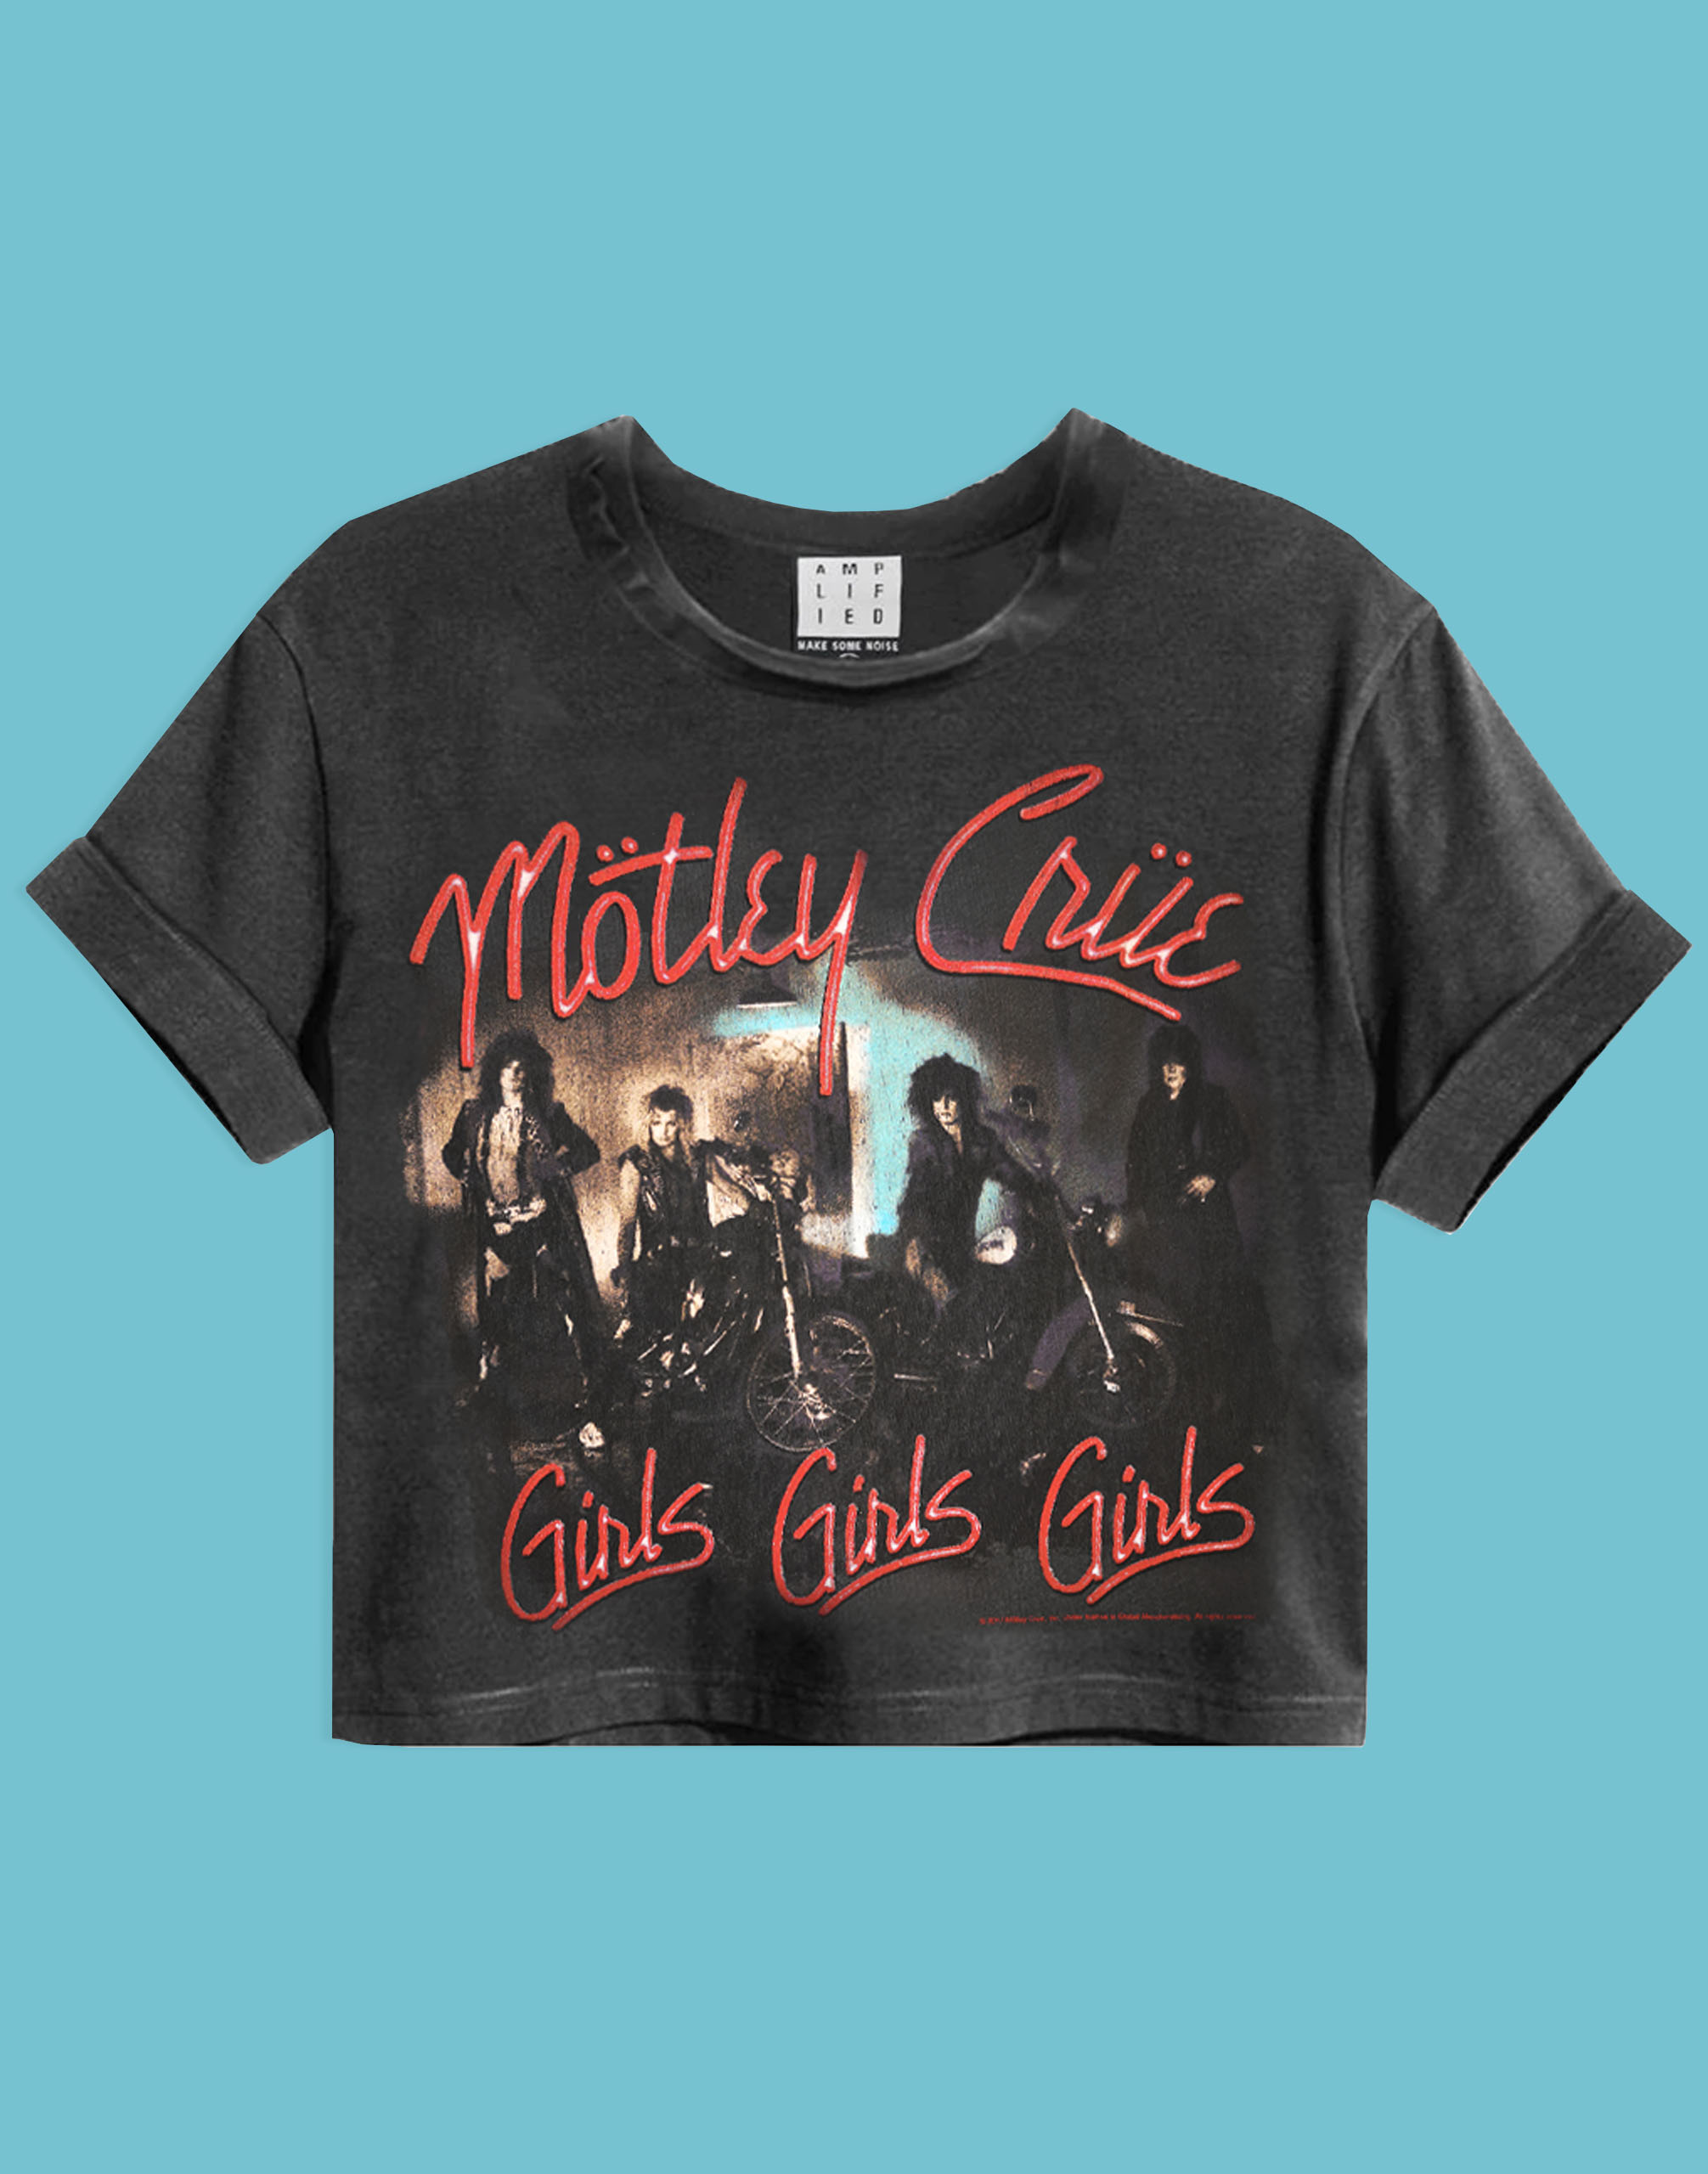 Amplified Motley Crew T-shirt pour fille